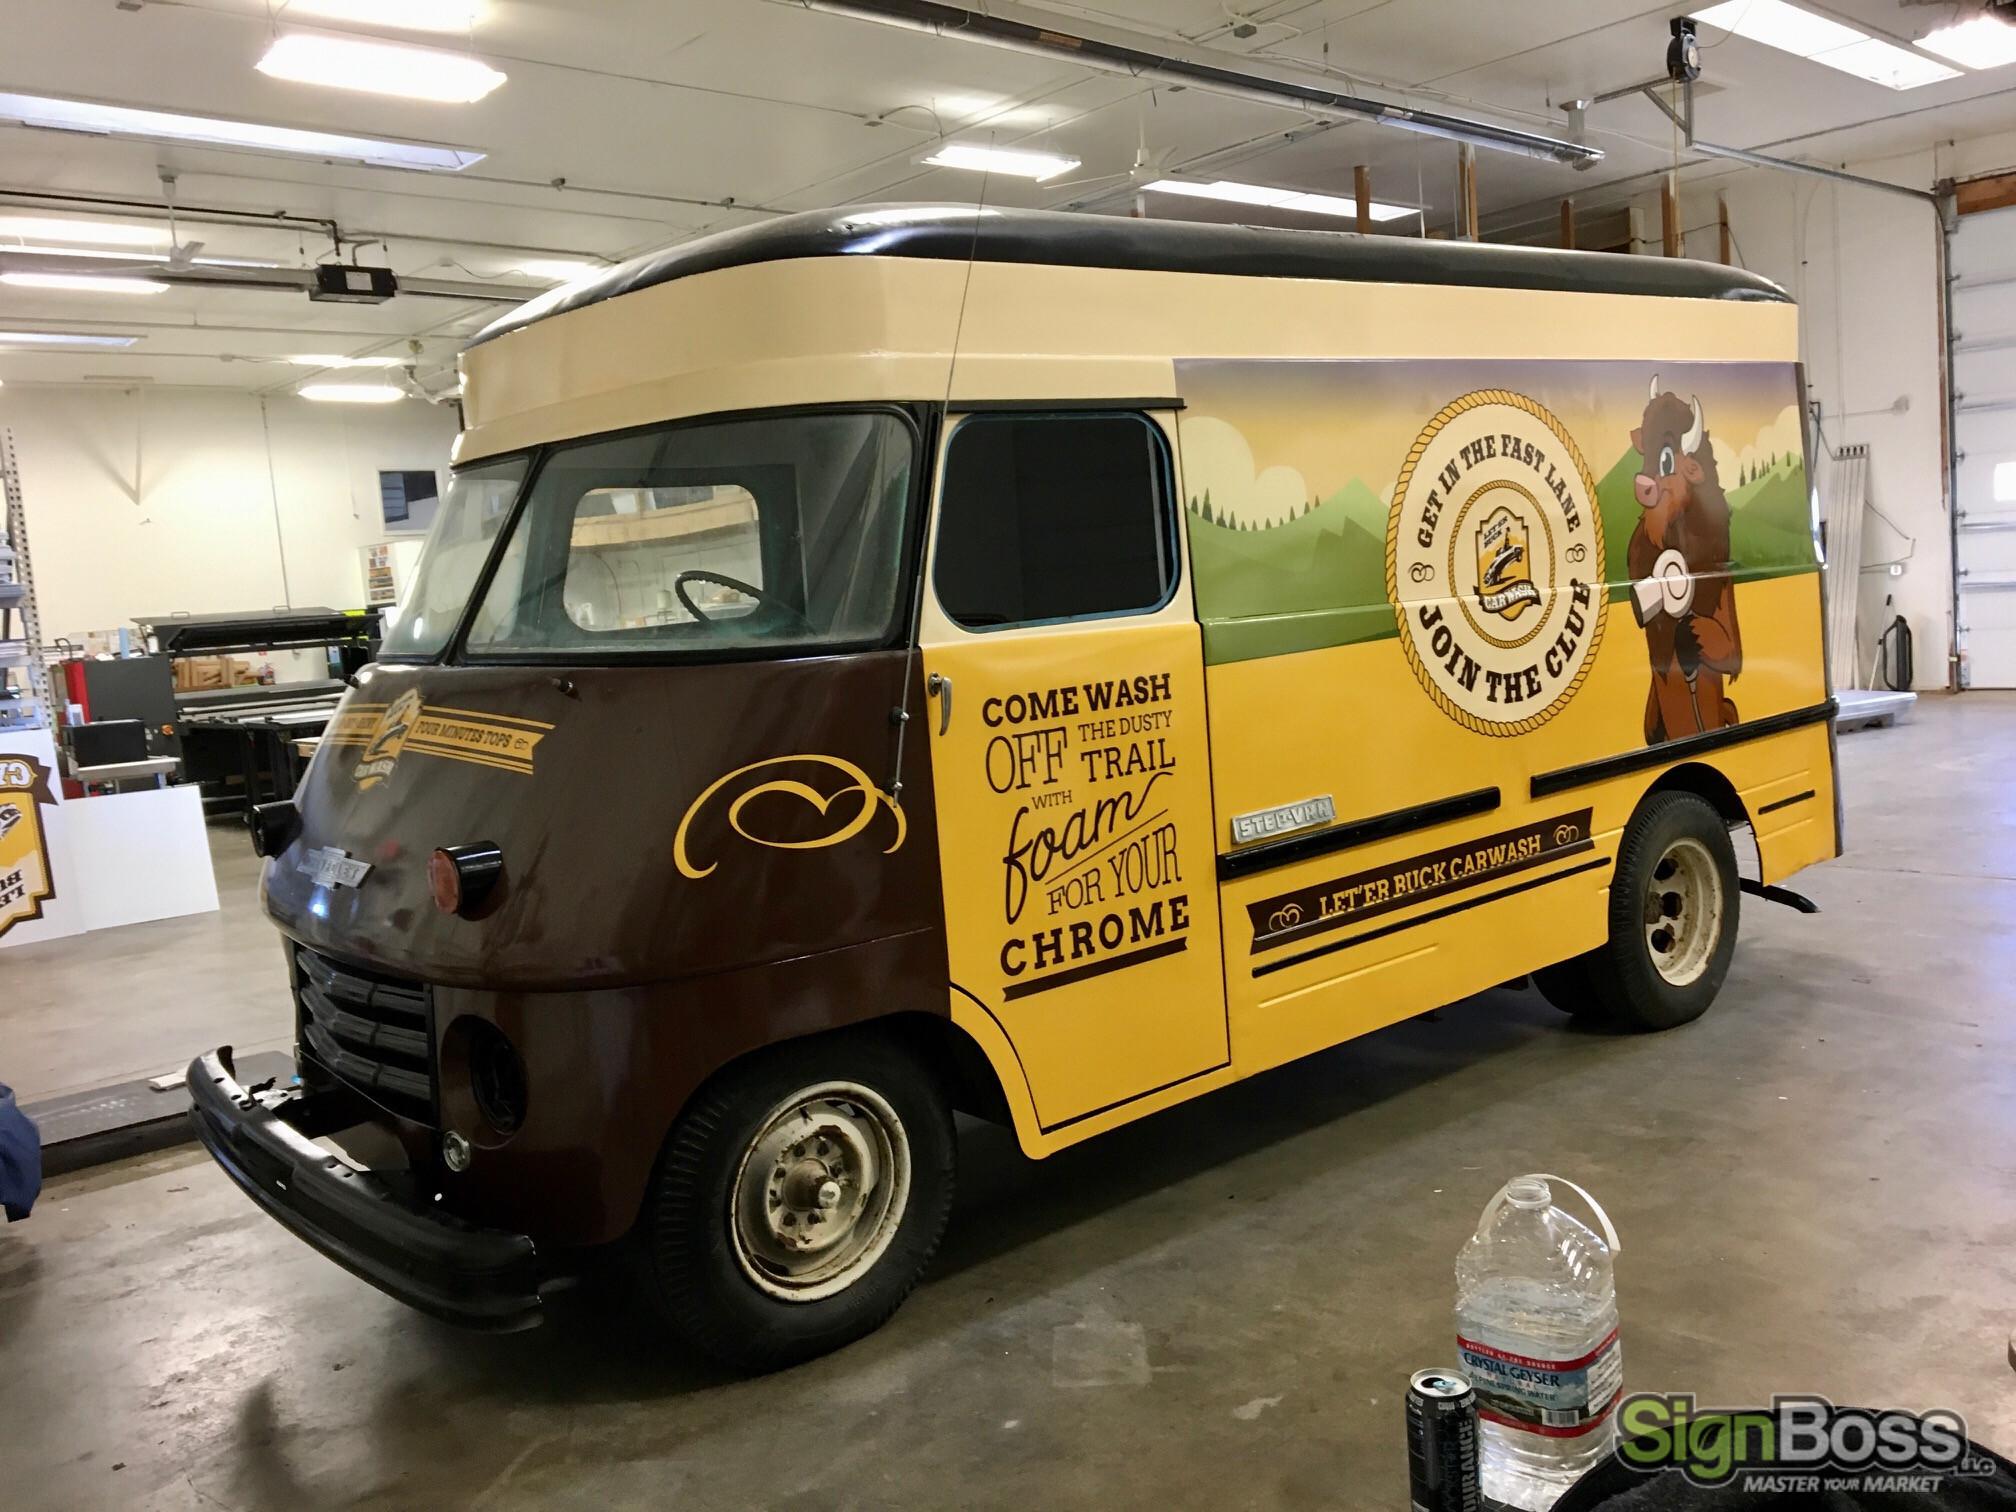 Promotional Van Wraps in Casper WY